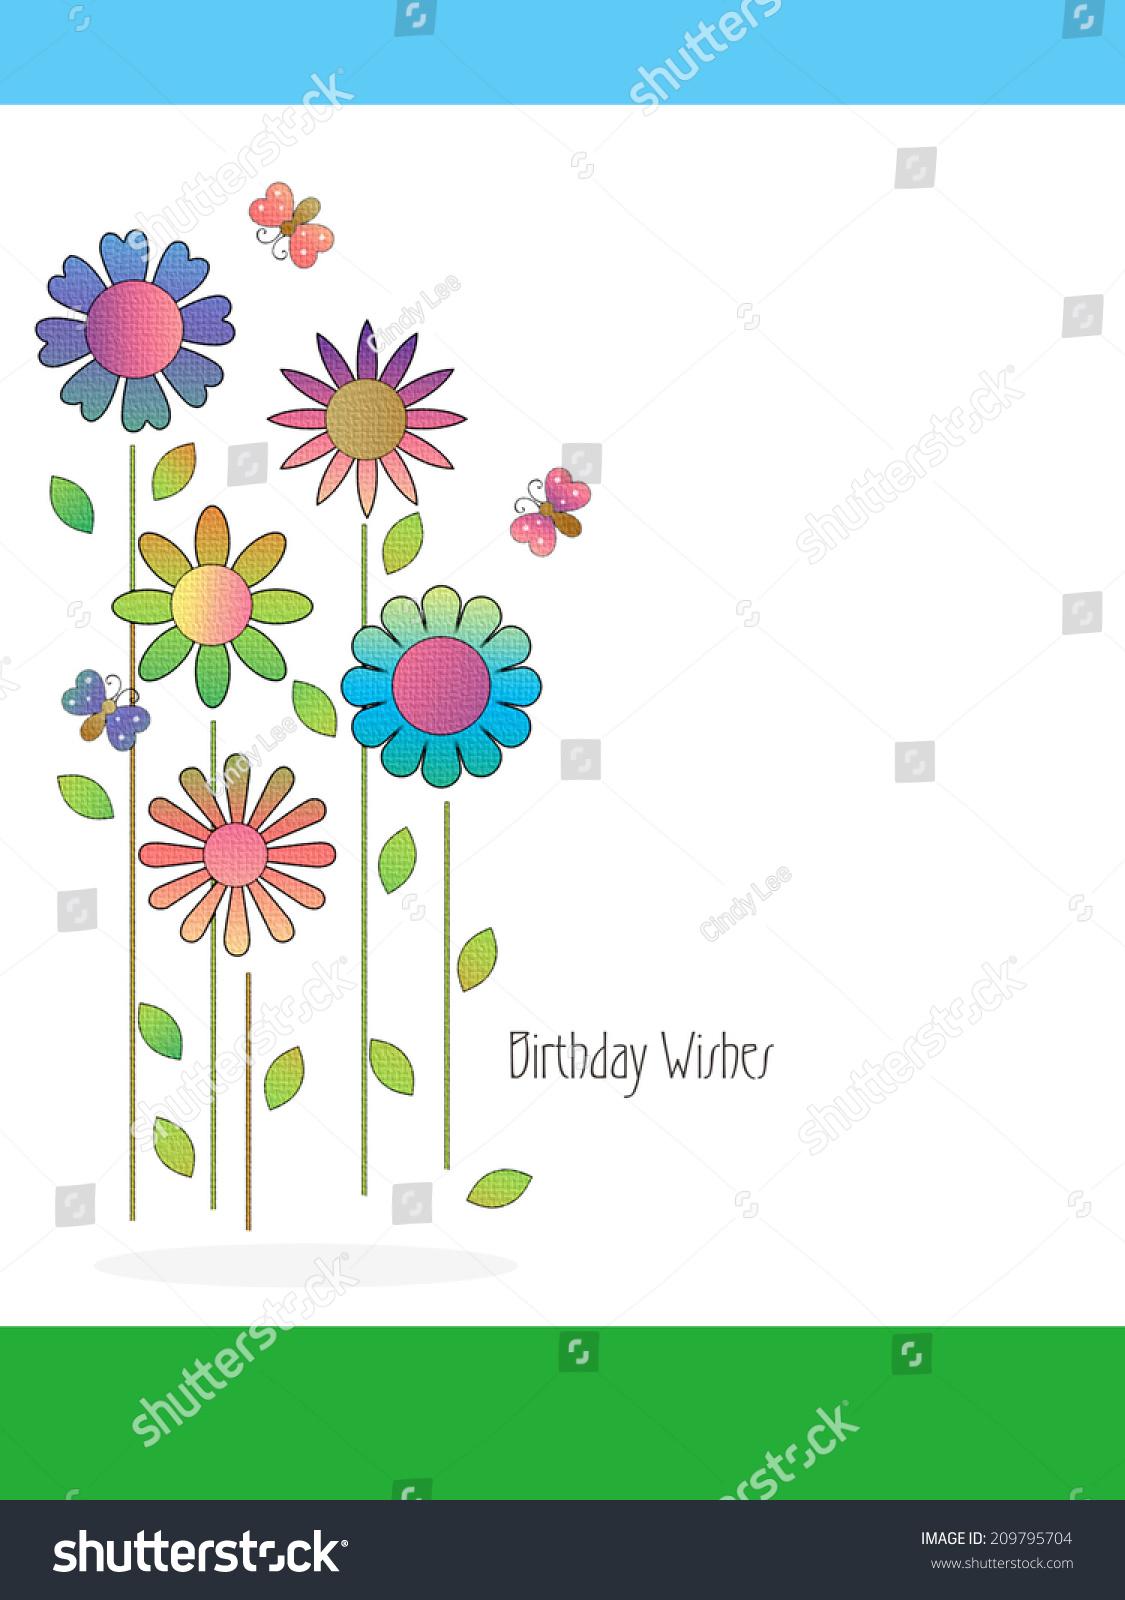 Flowers birthday wishes stock illustration 209795704 shutterstock flowers birthday wishes izmirmasajfo